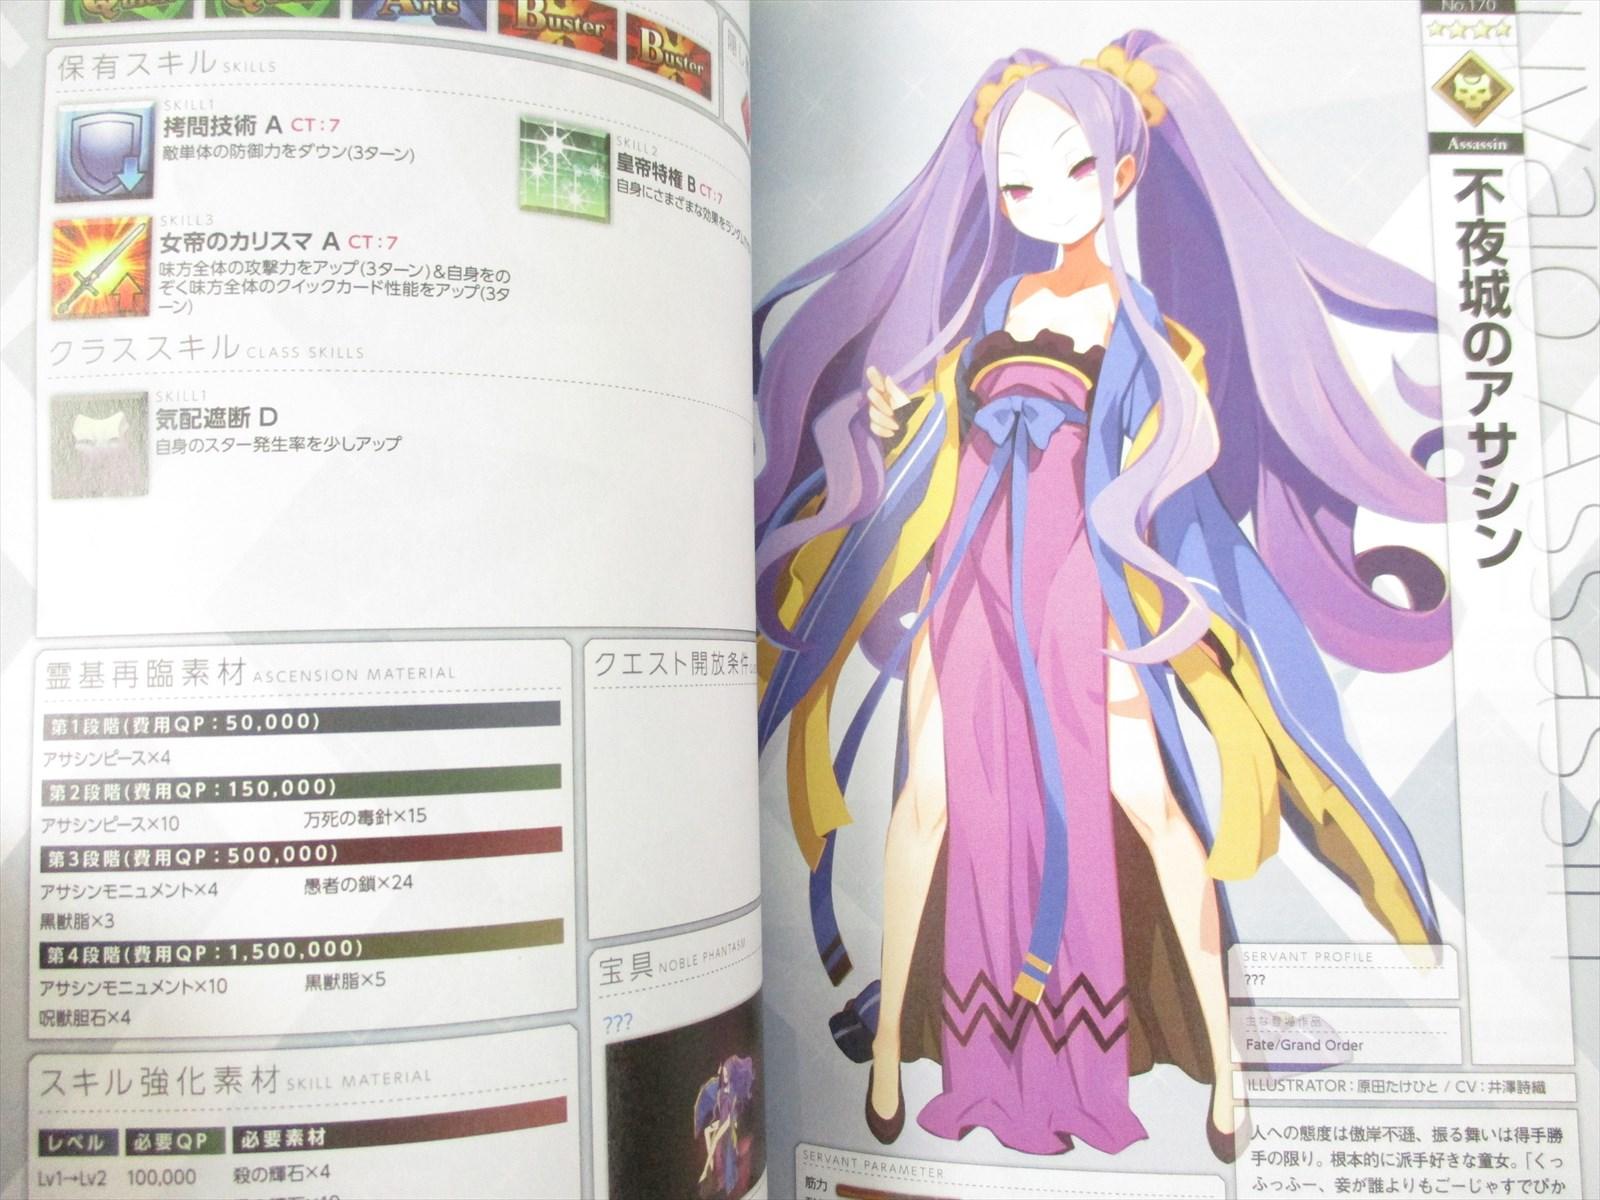 FATE GRAND ORDER Servant Storage II 2 Art Guide Book Ltd Type-Moon *